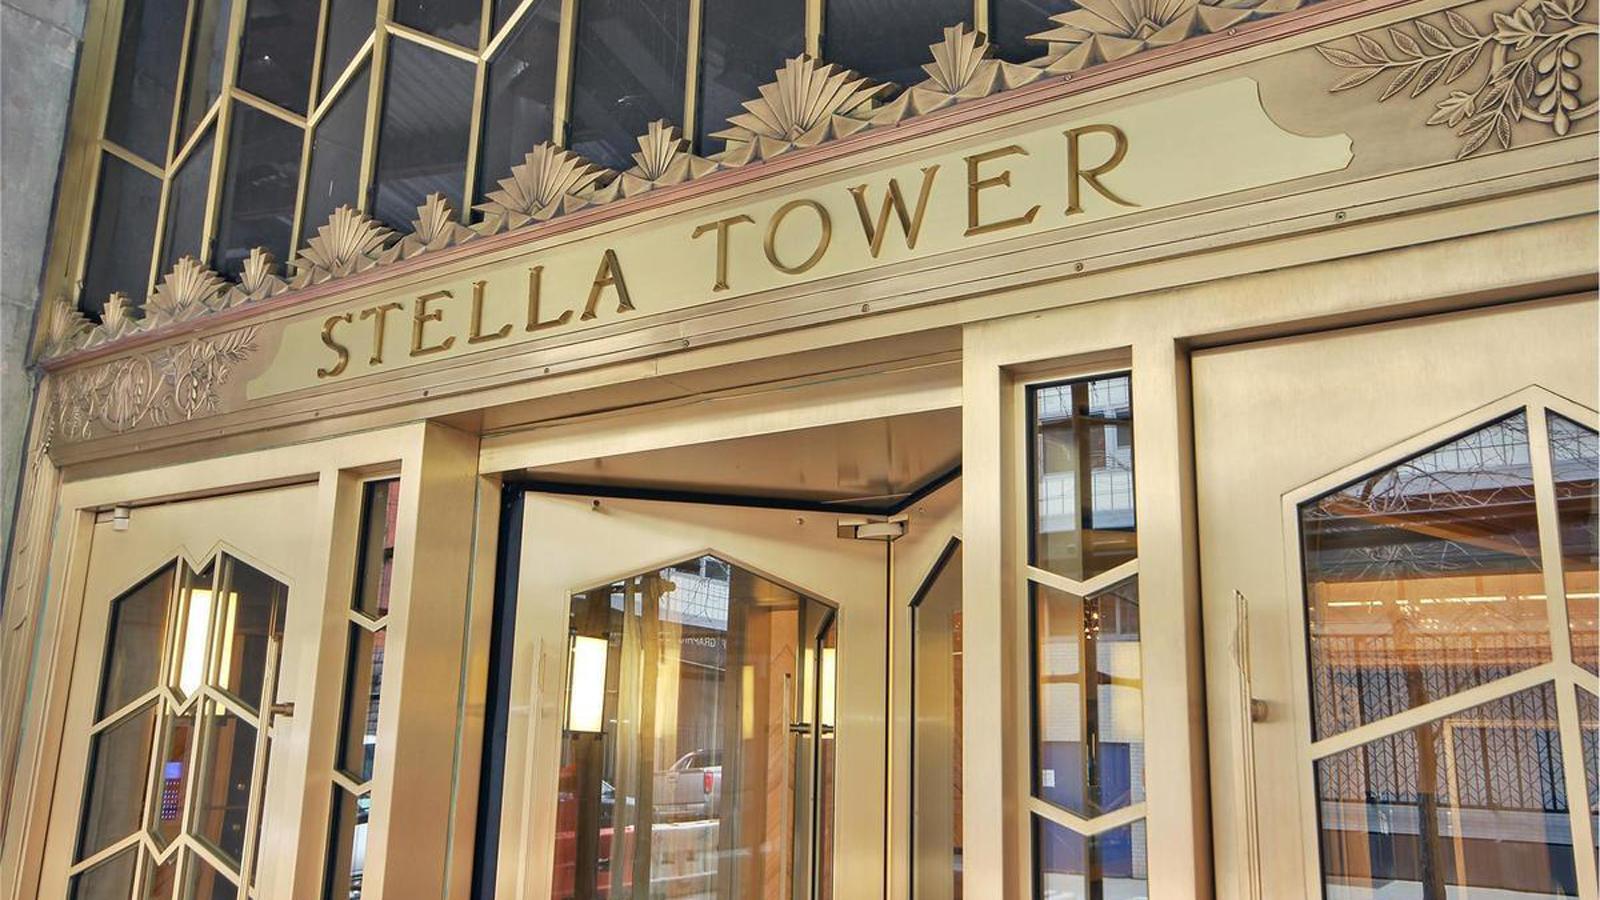 Stella Tower, 425 West 50th Street